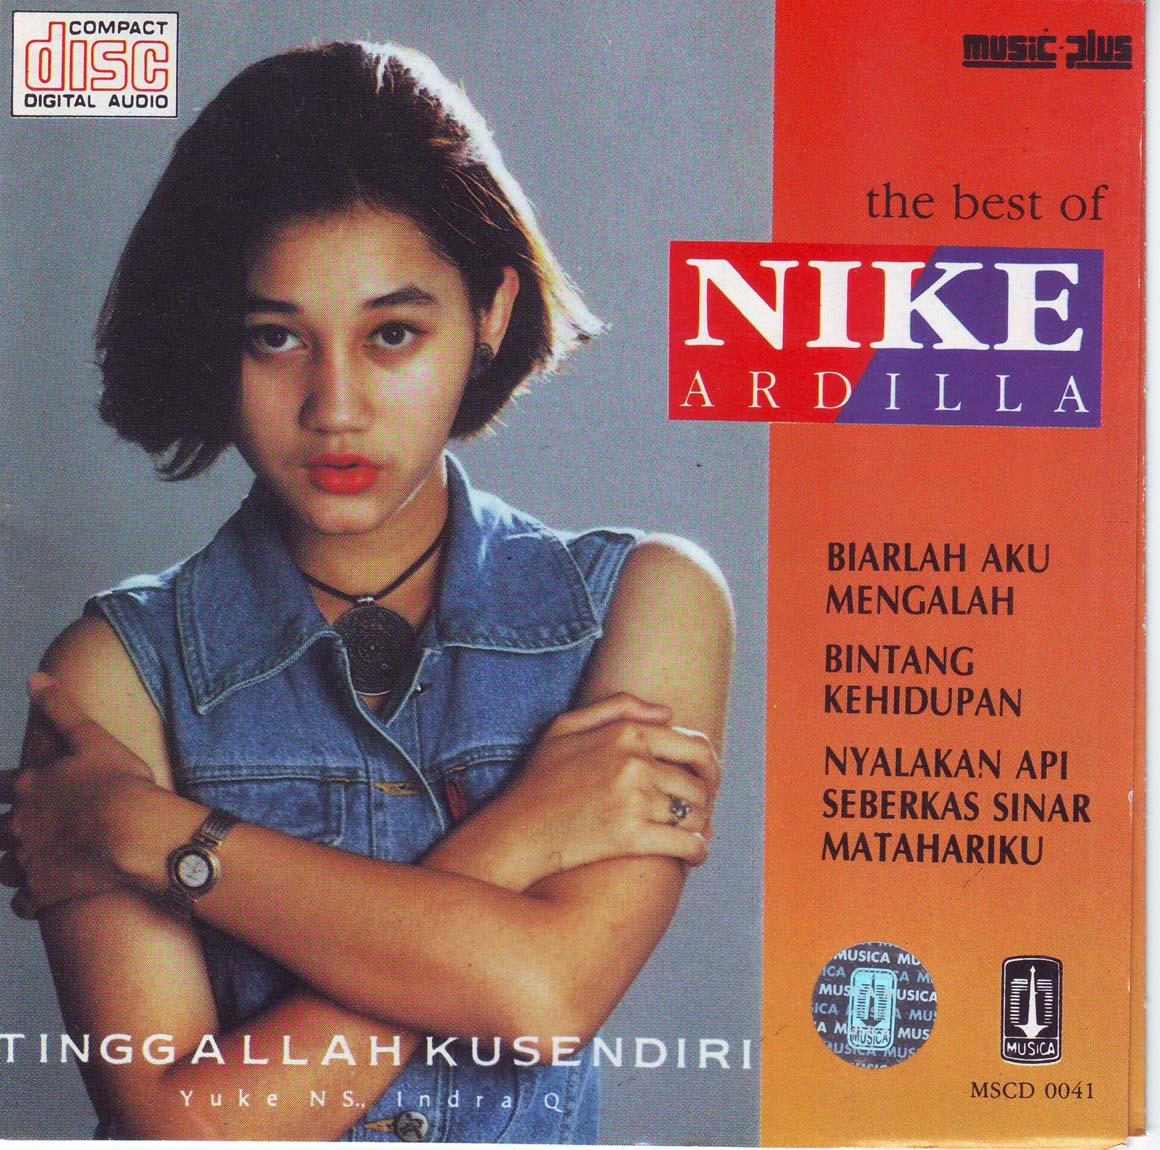 Chord Lagu Nike Ardila Tak Bersuara: Garuda Music: Nike Ardilla